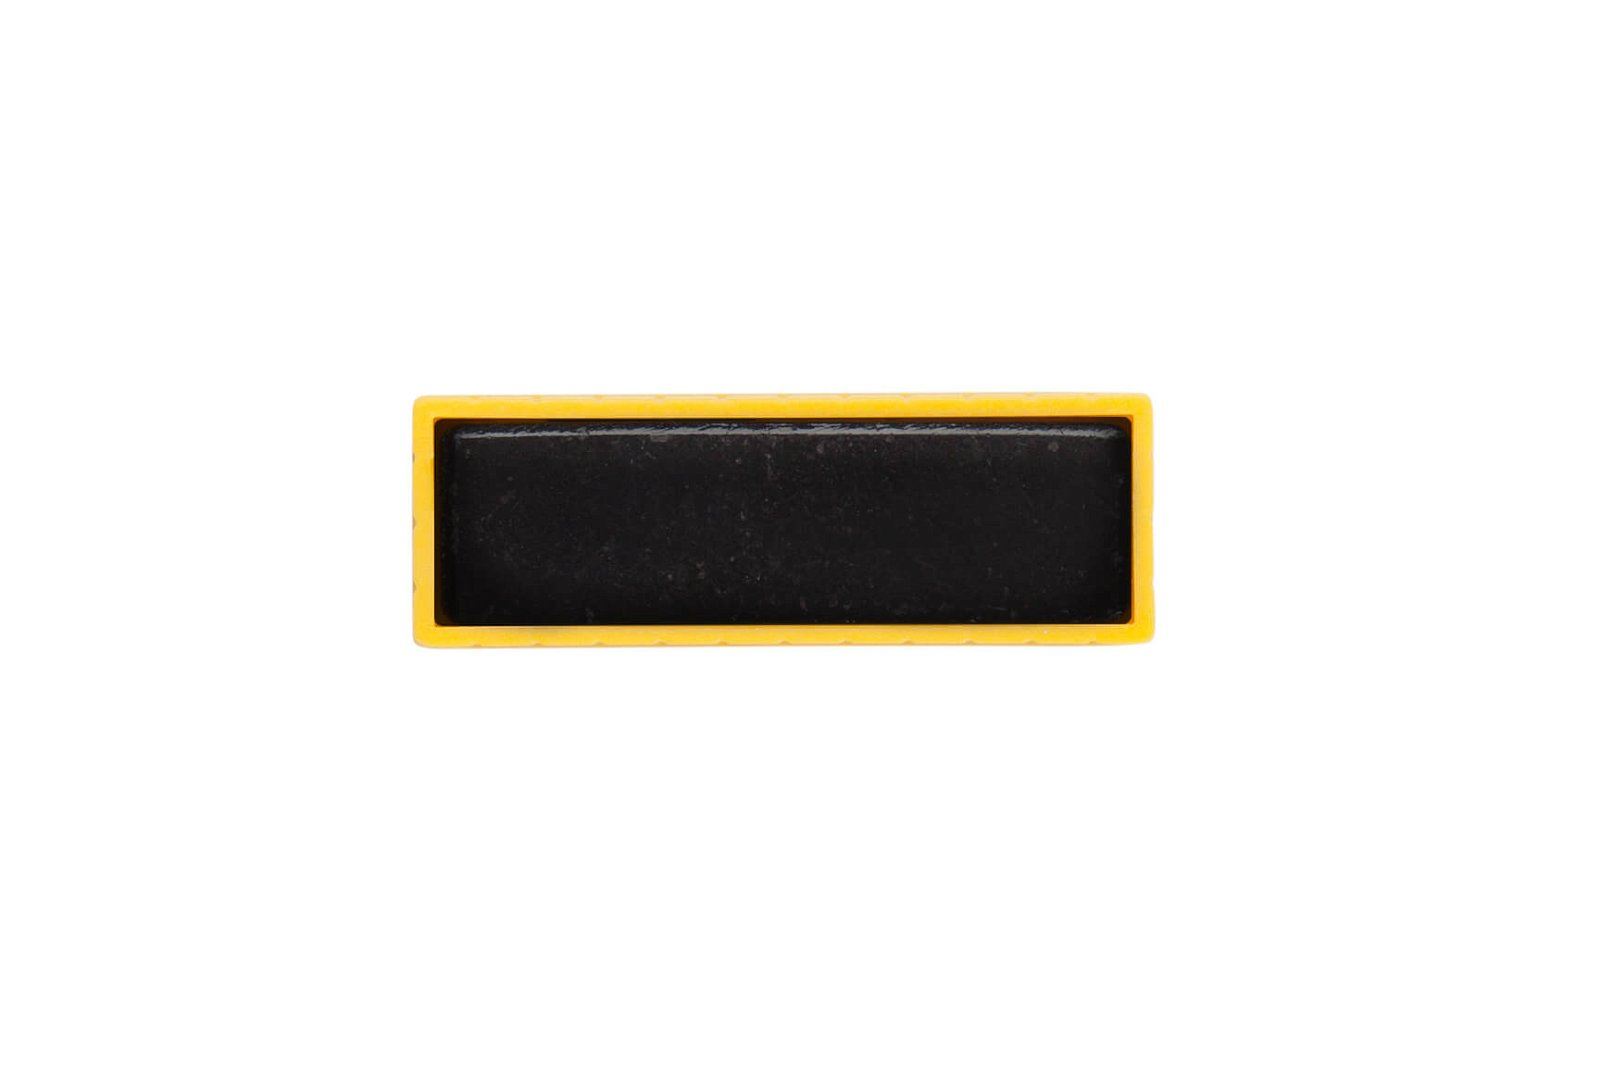 Magnet MAULsolid 54 x 19 mm, 1 kg Haftkraft, 10 St./Ktn., gelb